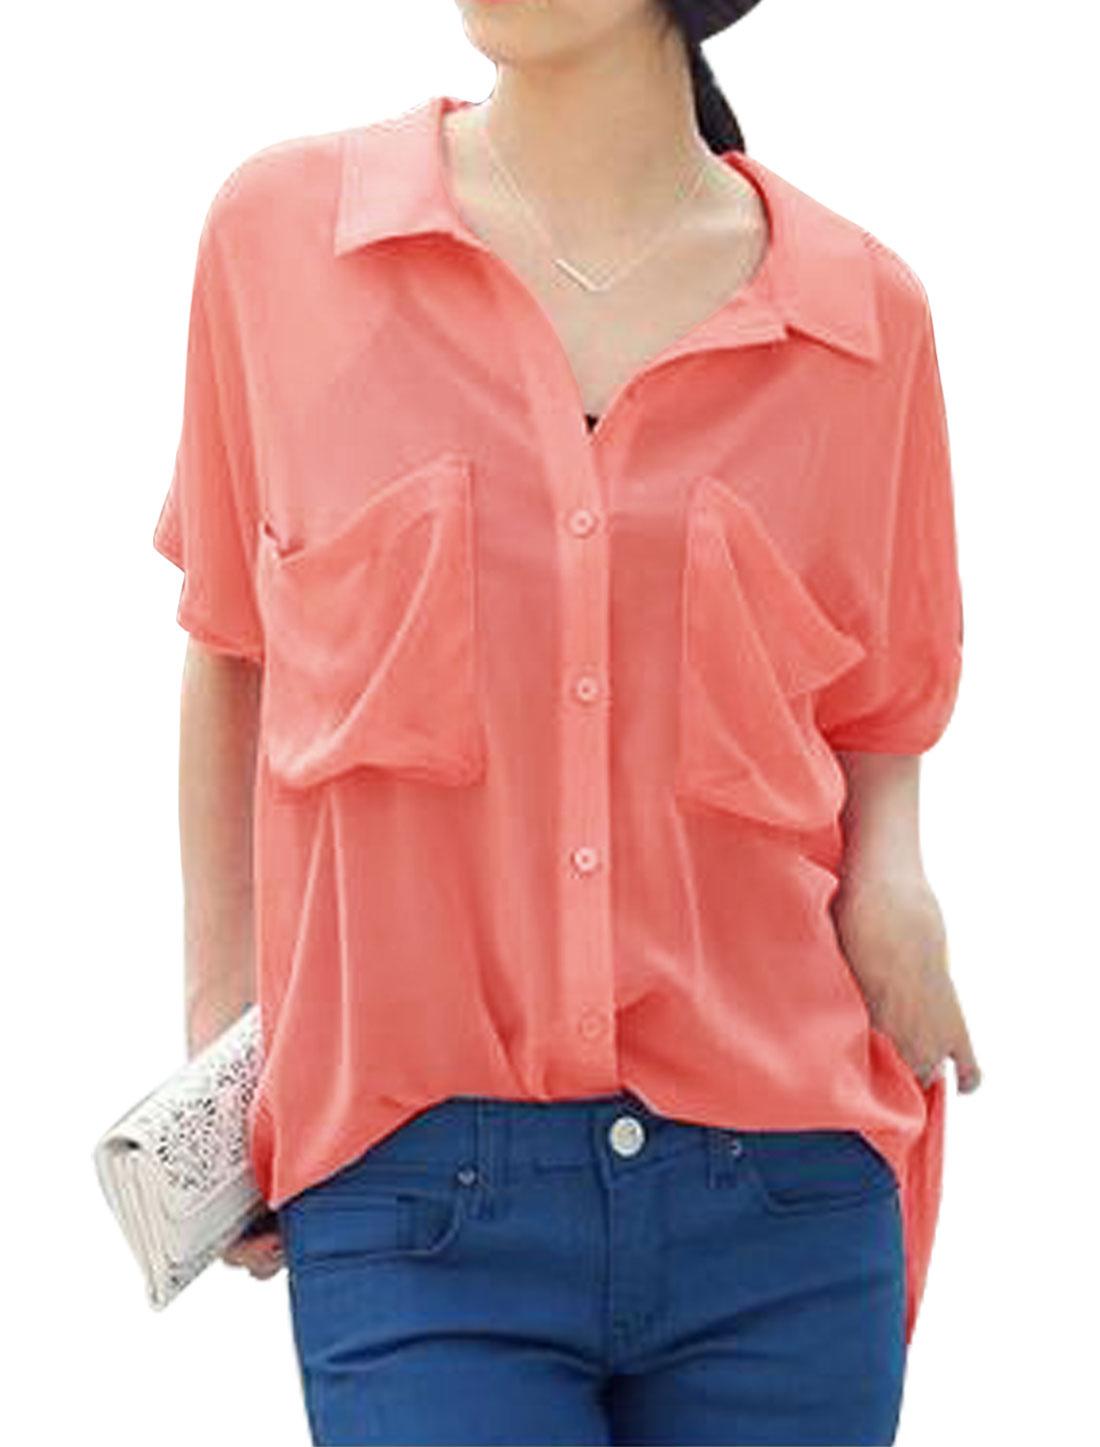 Woman Short Sleeves Point Collor High Low Hem Chiffon Tunic Shirt Watermelon Red S